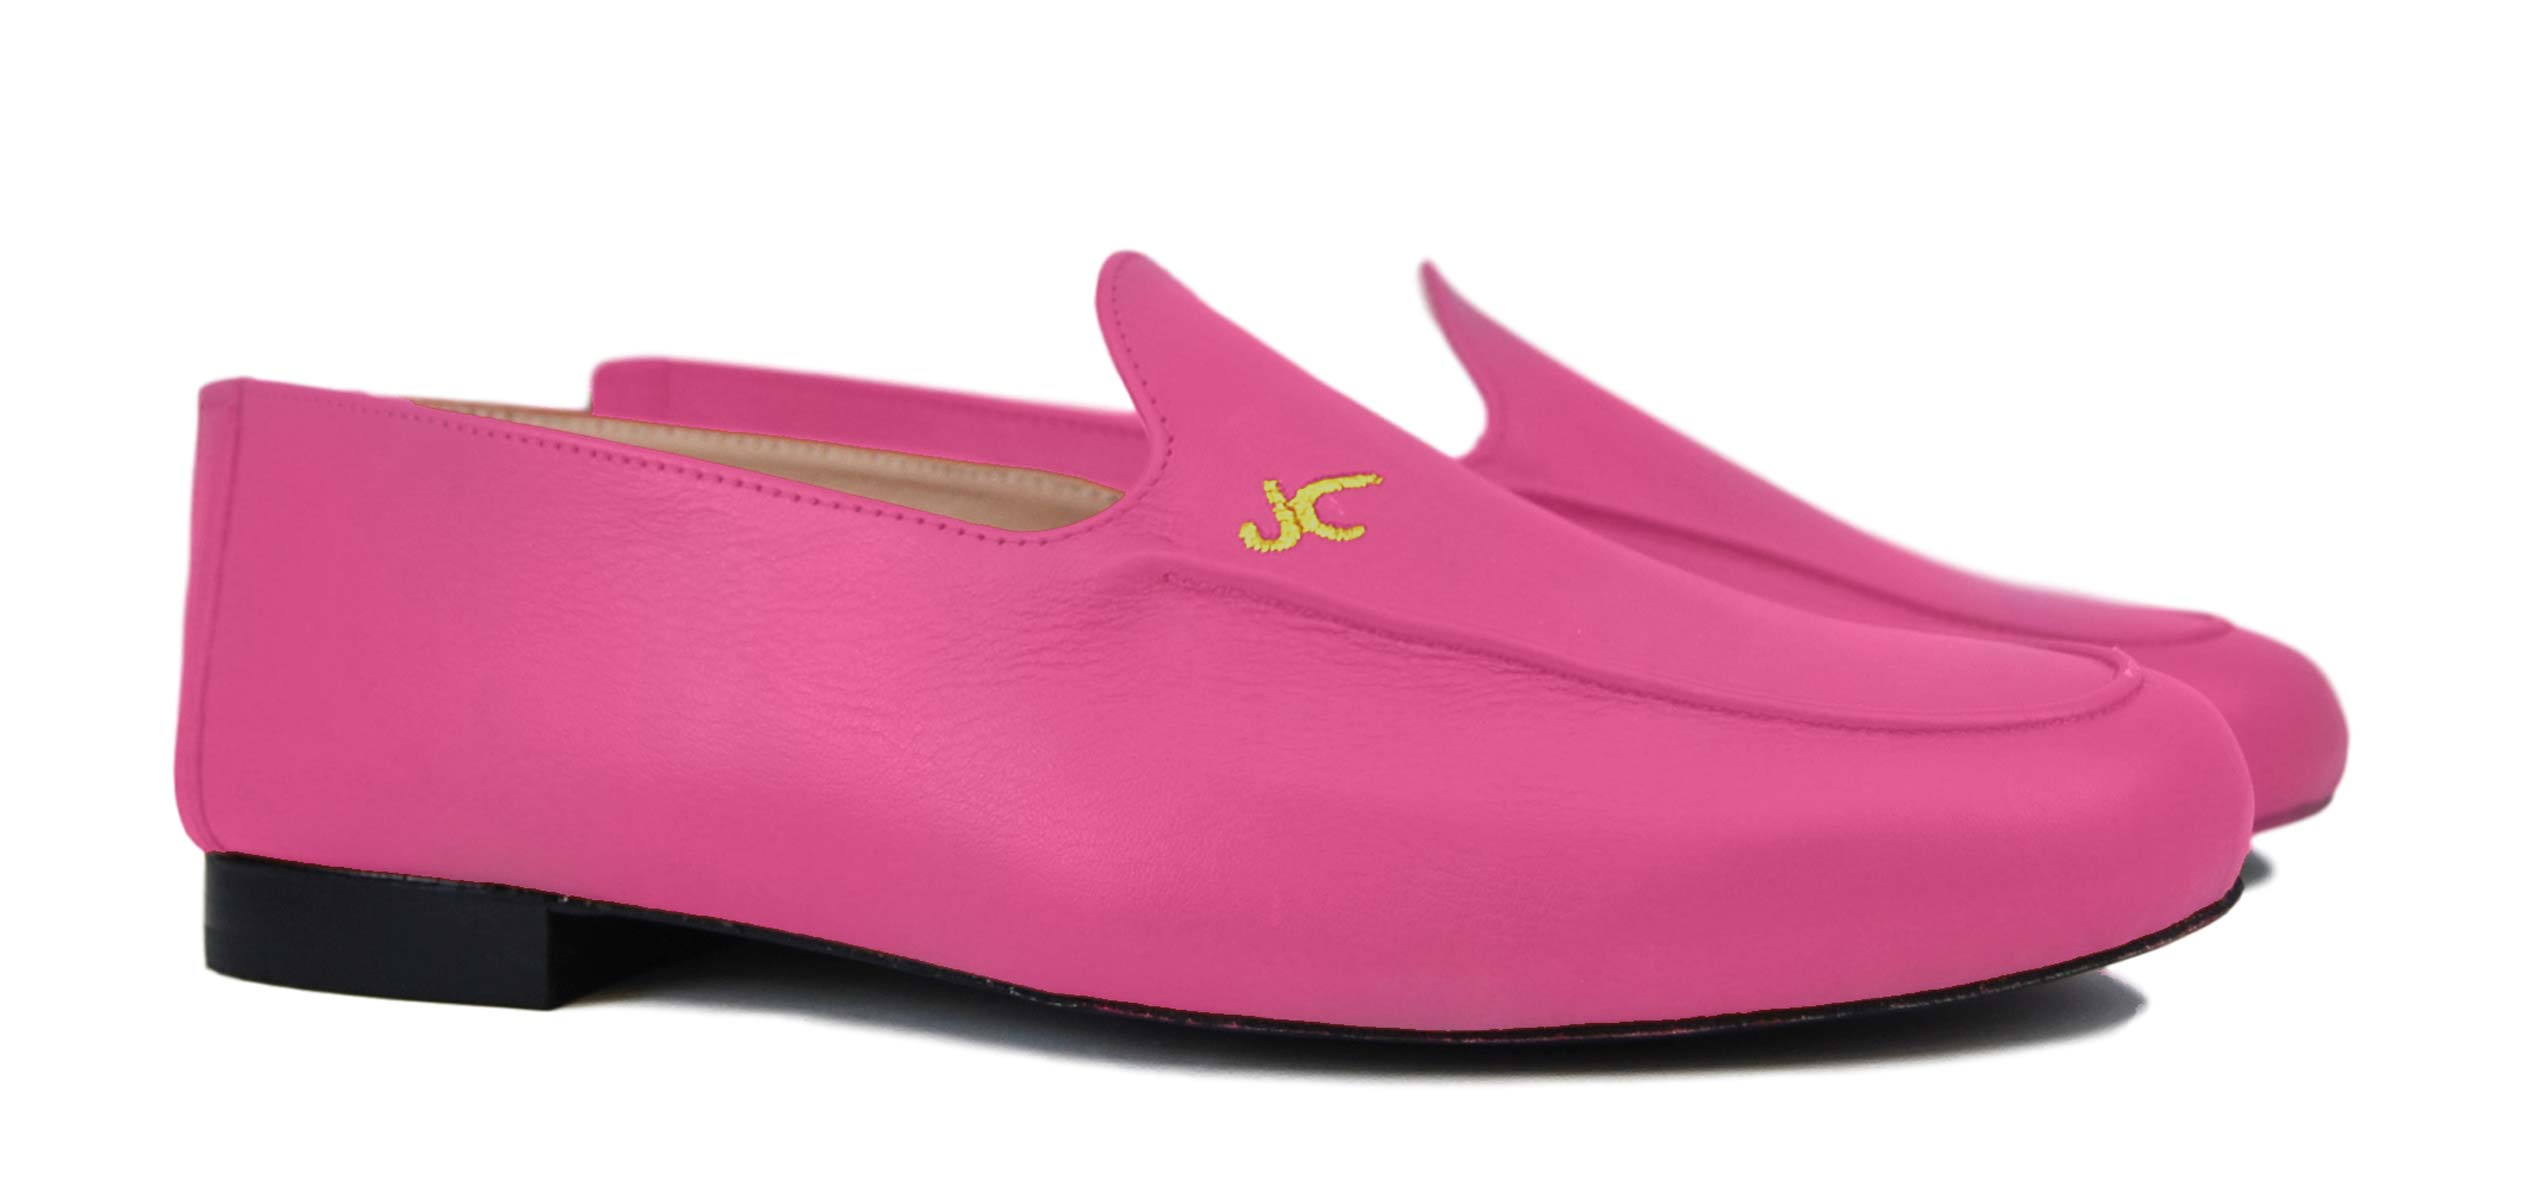 Foto 5 de Zapatos Julio Iglesias 528 JC Sachet Napa